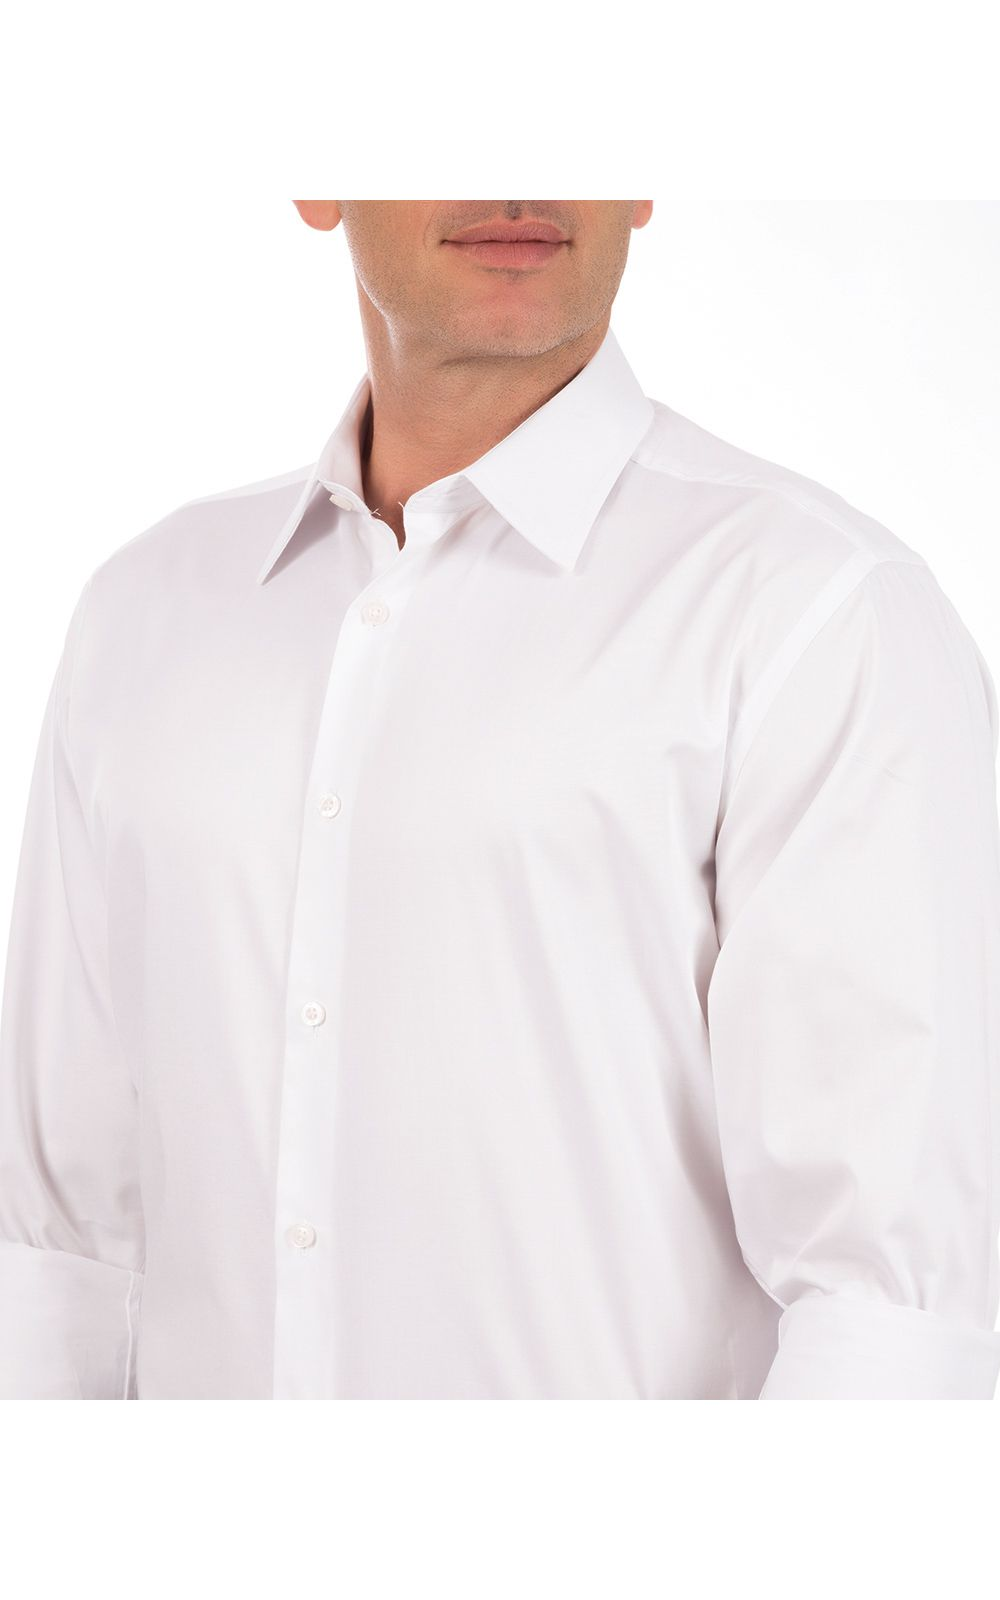 Foto 3 - Camisa Social Masculina Branca Lisa